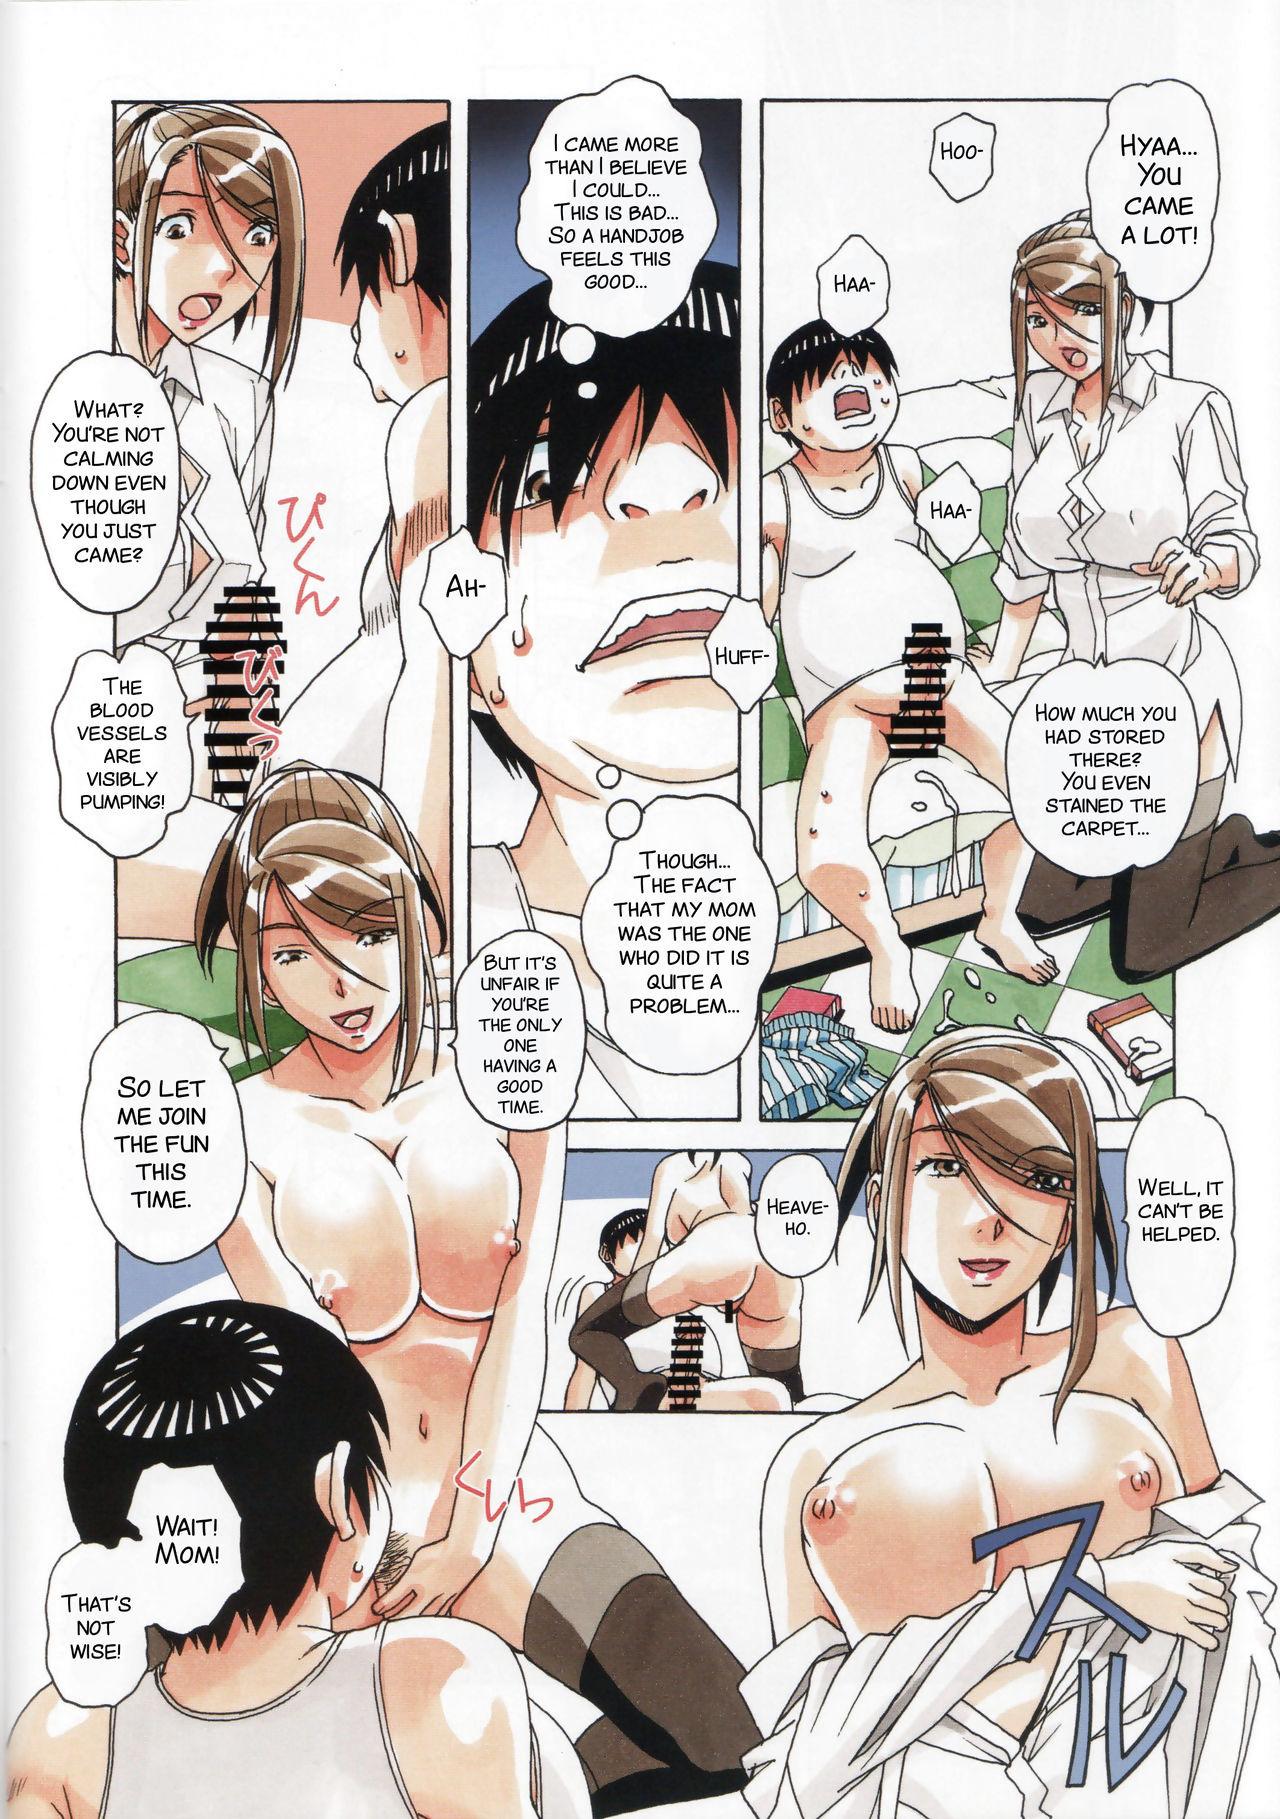 Kyoudai Yuugi - Brother Game - part 2